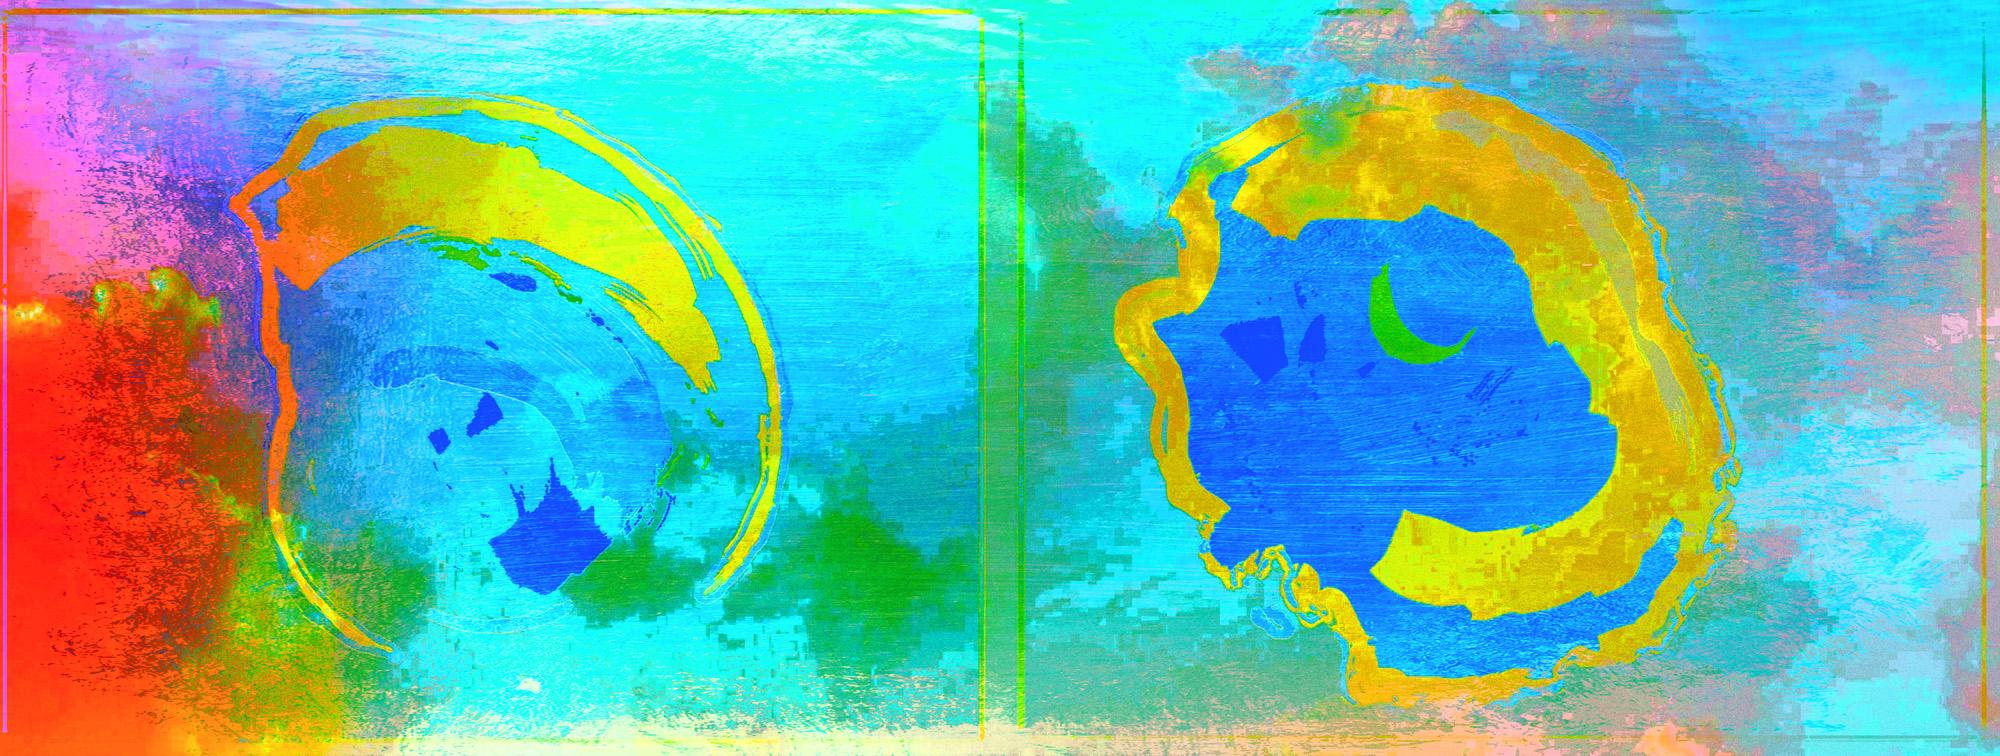 shells-dissolve-in-acidified-ocean-water